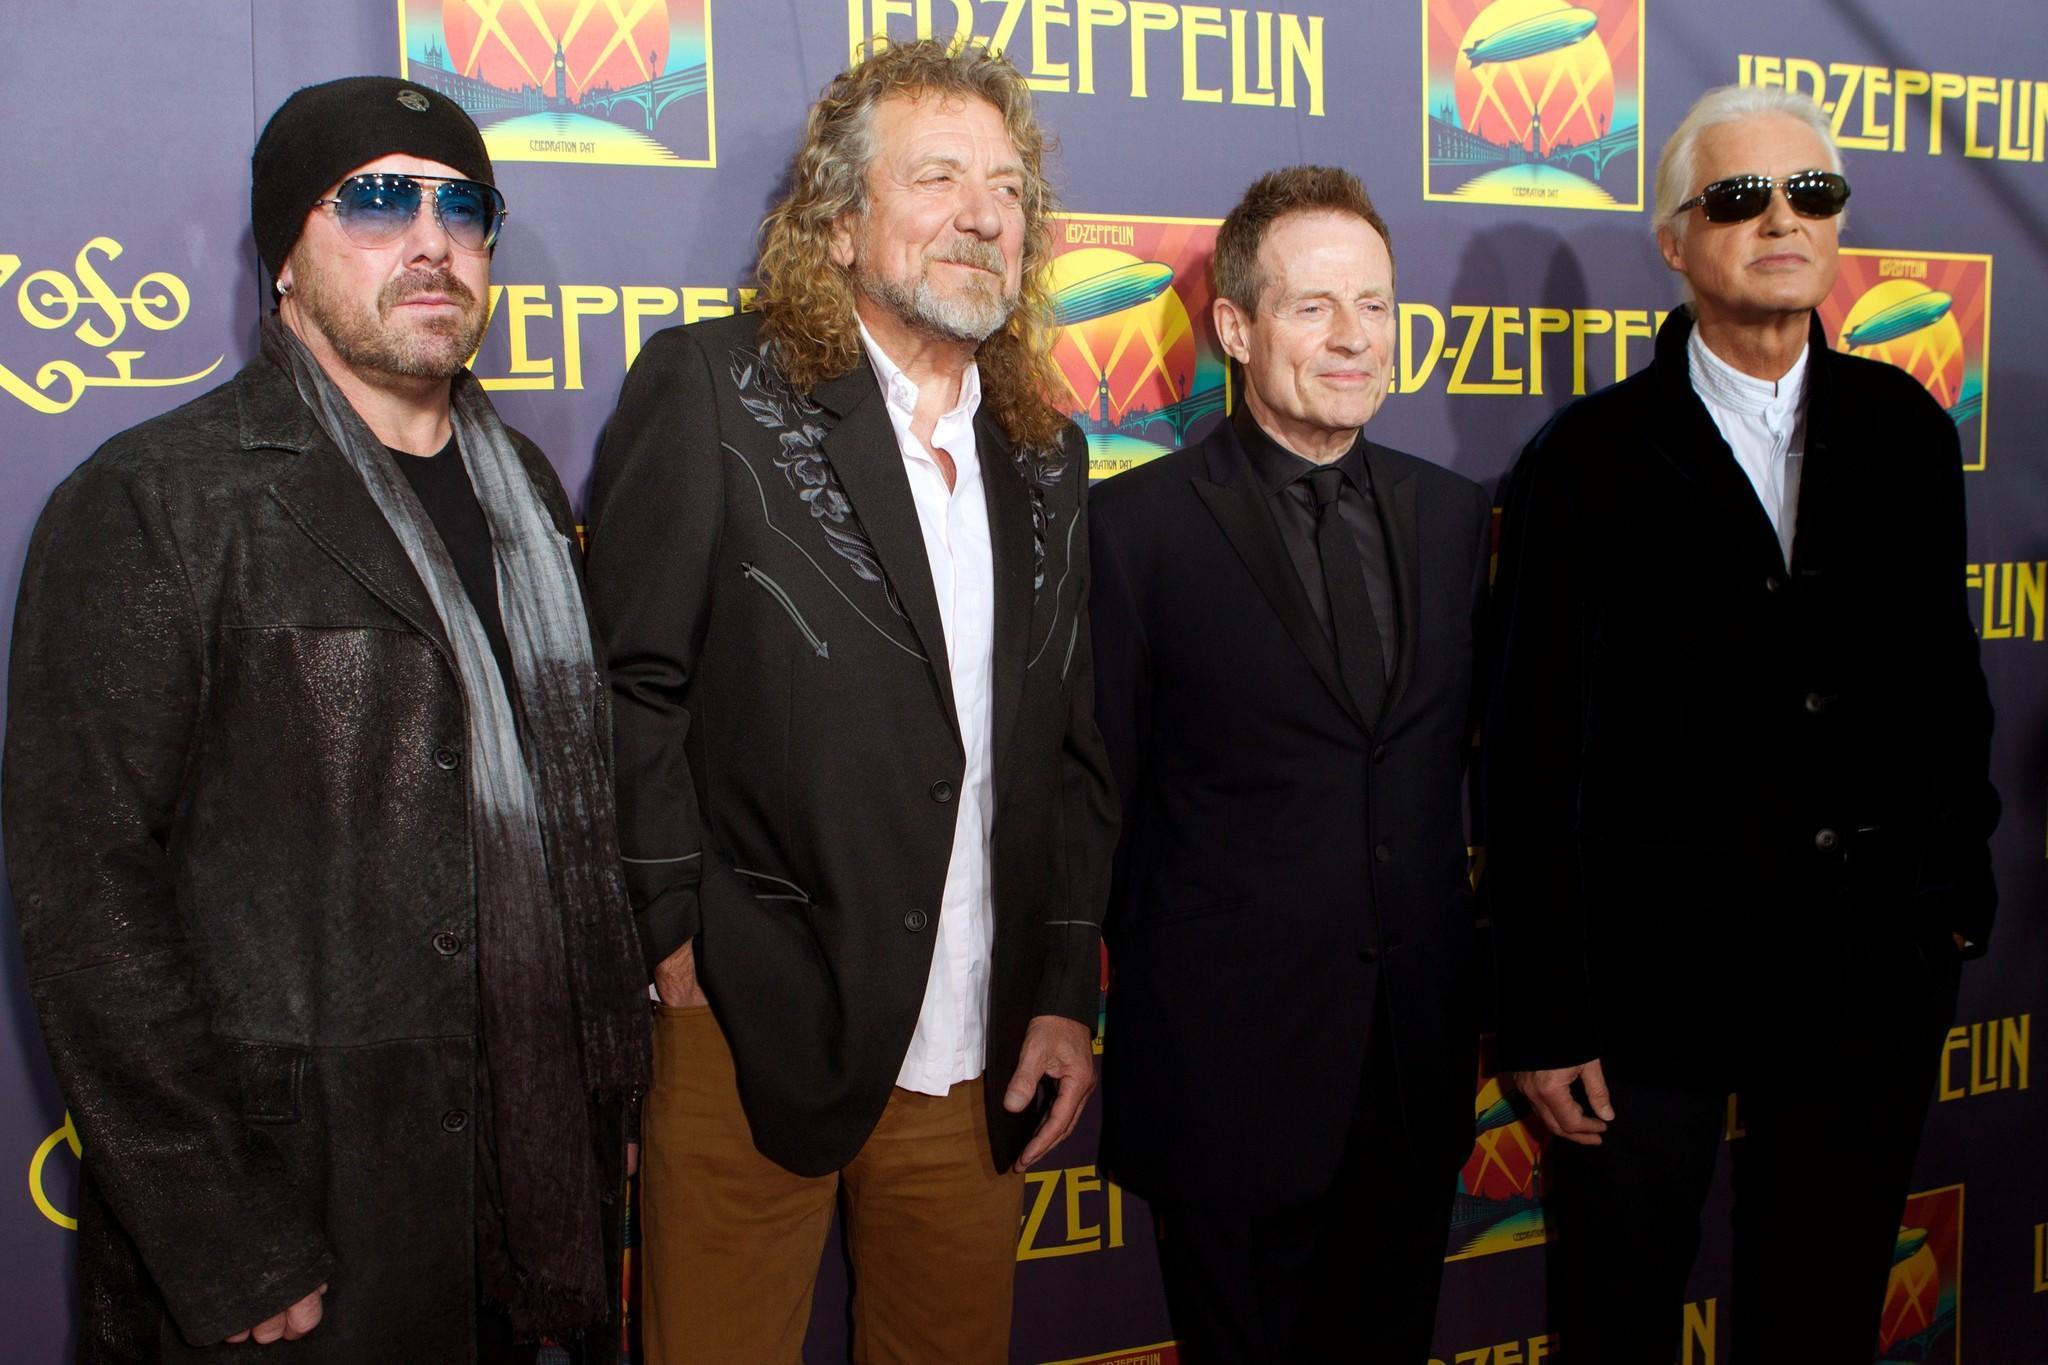 Led Zeppelin wins best rock album.